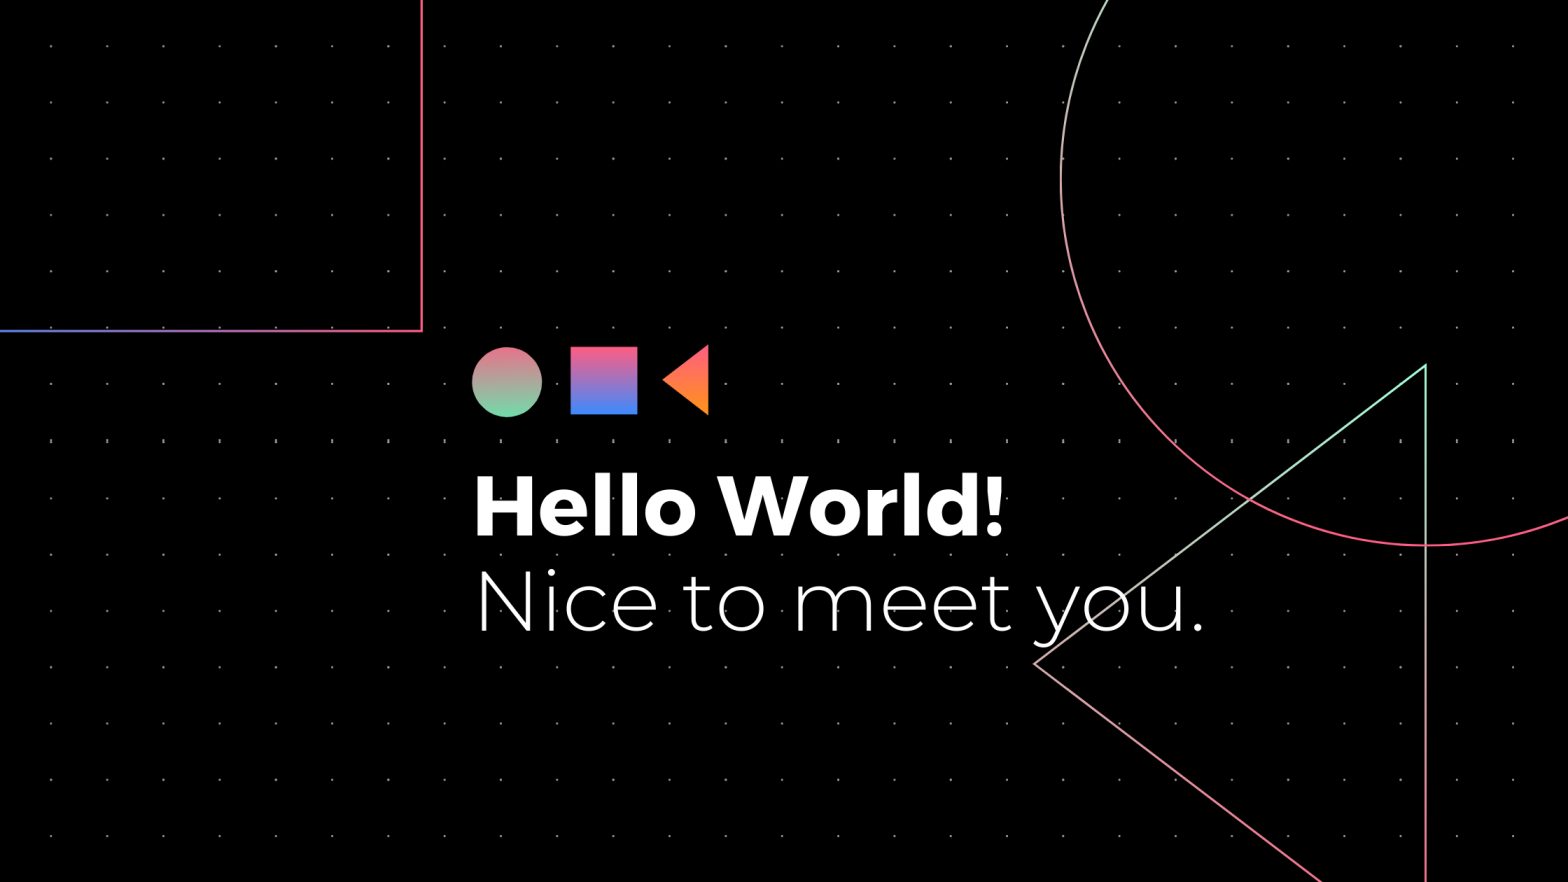 Hello World from Anupinder Singh